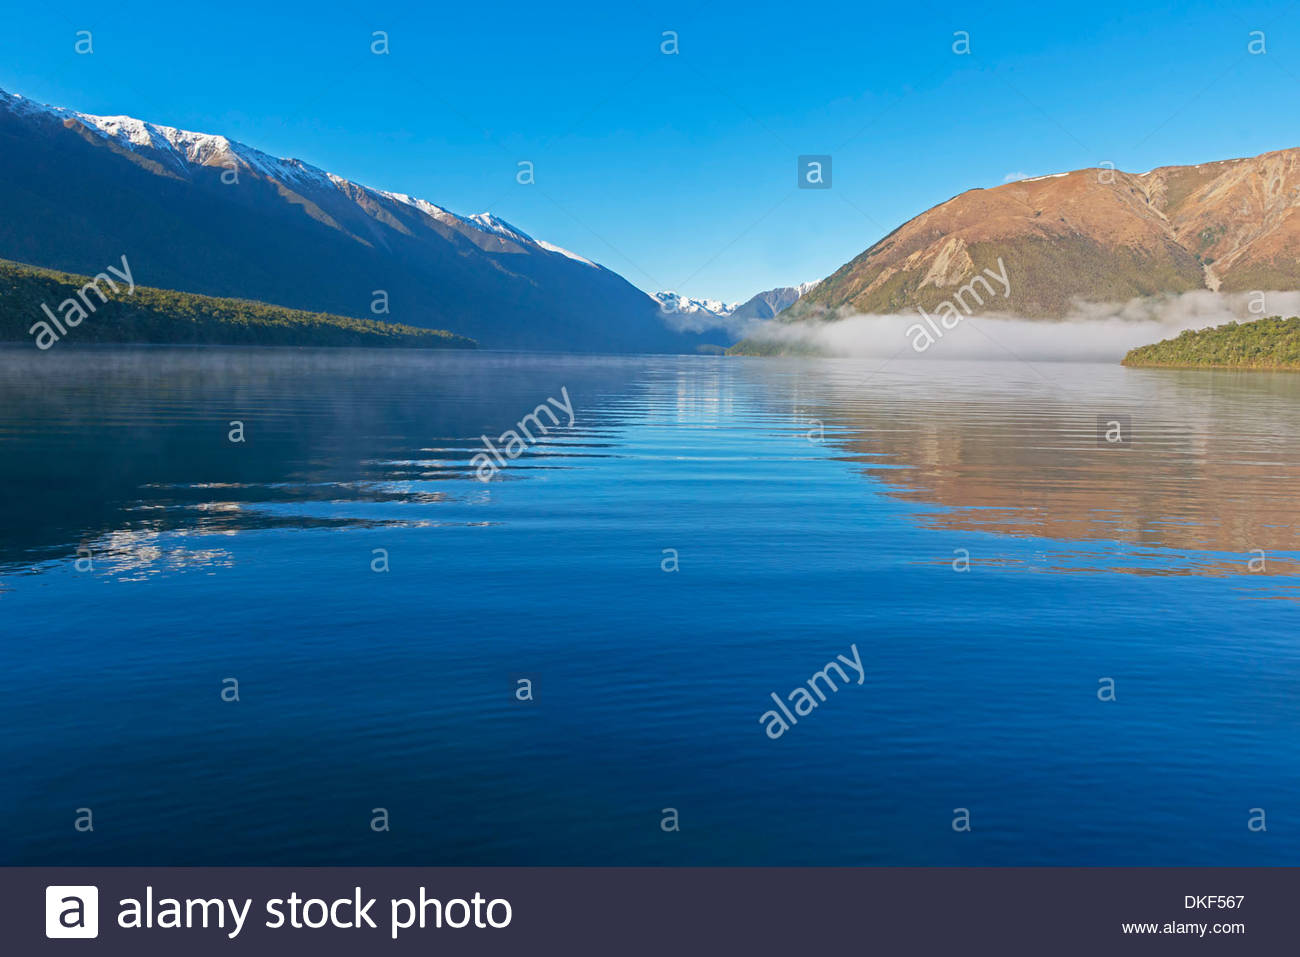 Reflections on lake Rotoiti, Nelson Lakes National Park, South Island, New Zealand - Stock Image